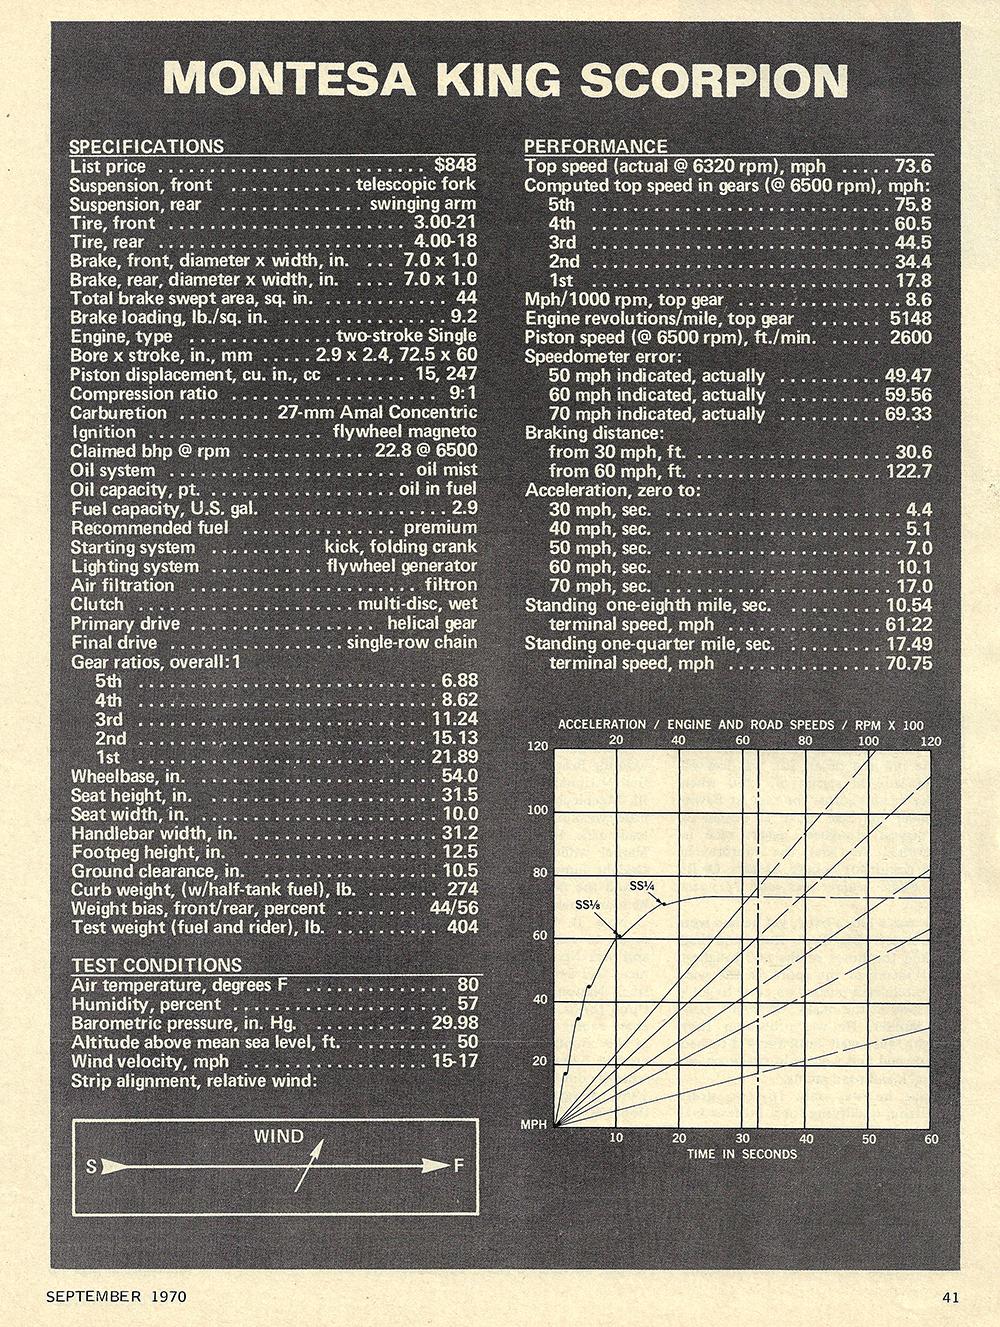 1970 Montesa King Scorpion road test 04.jpg